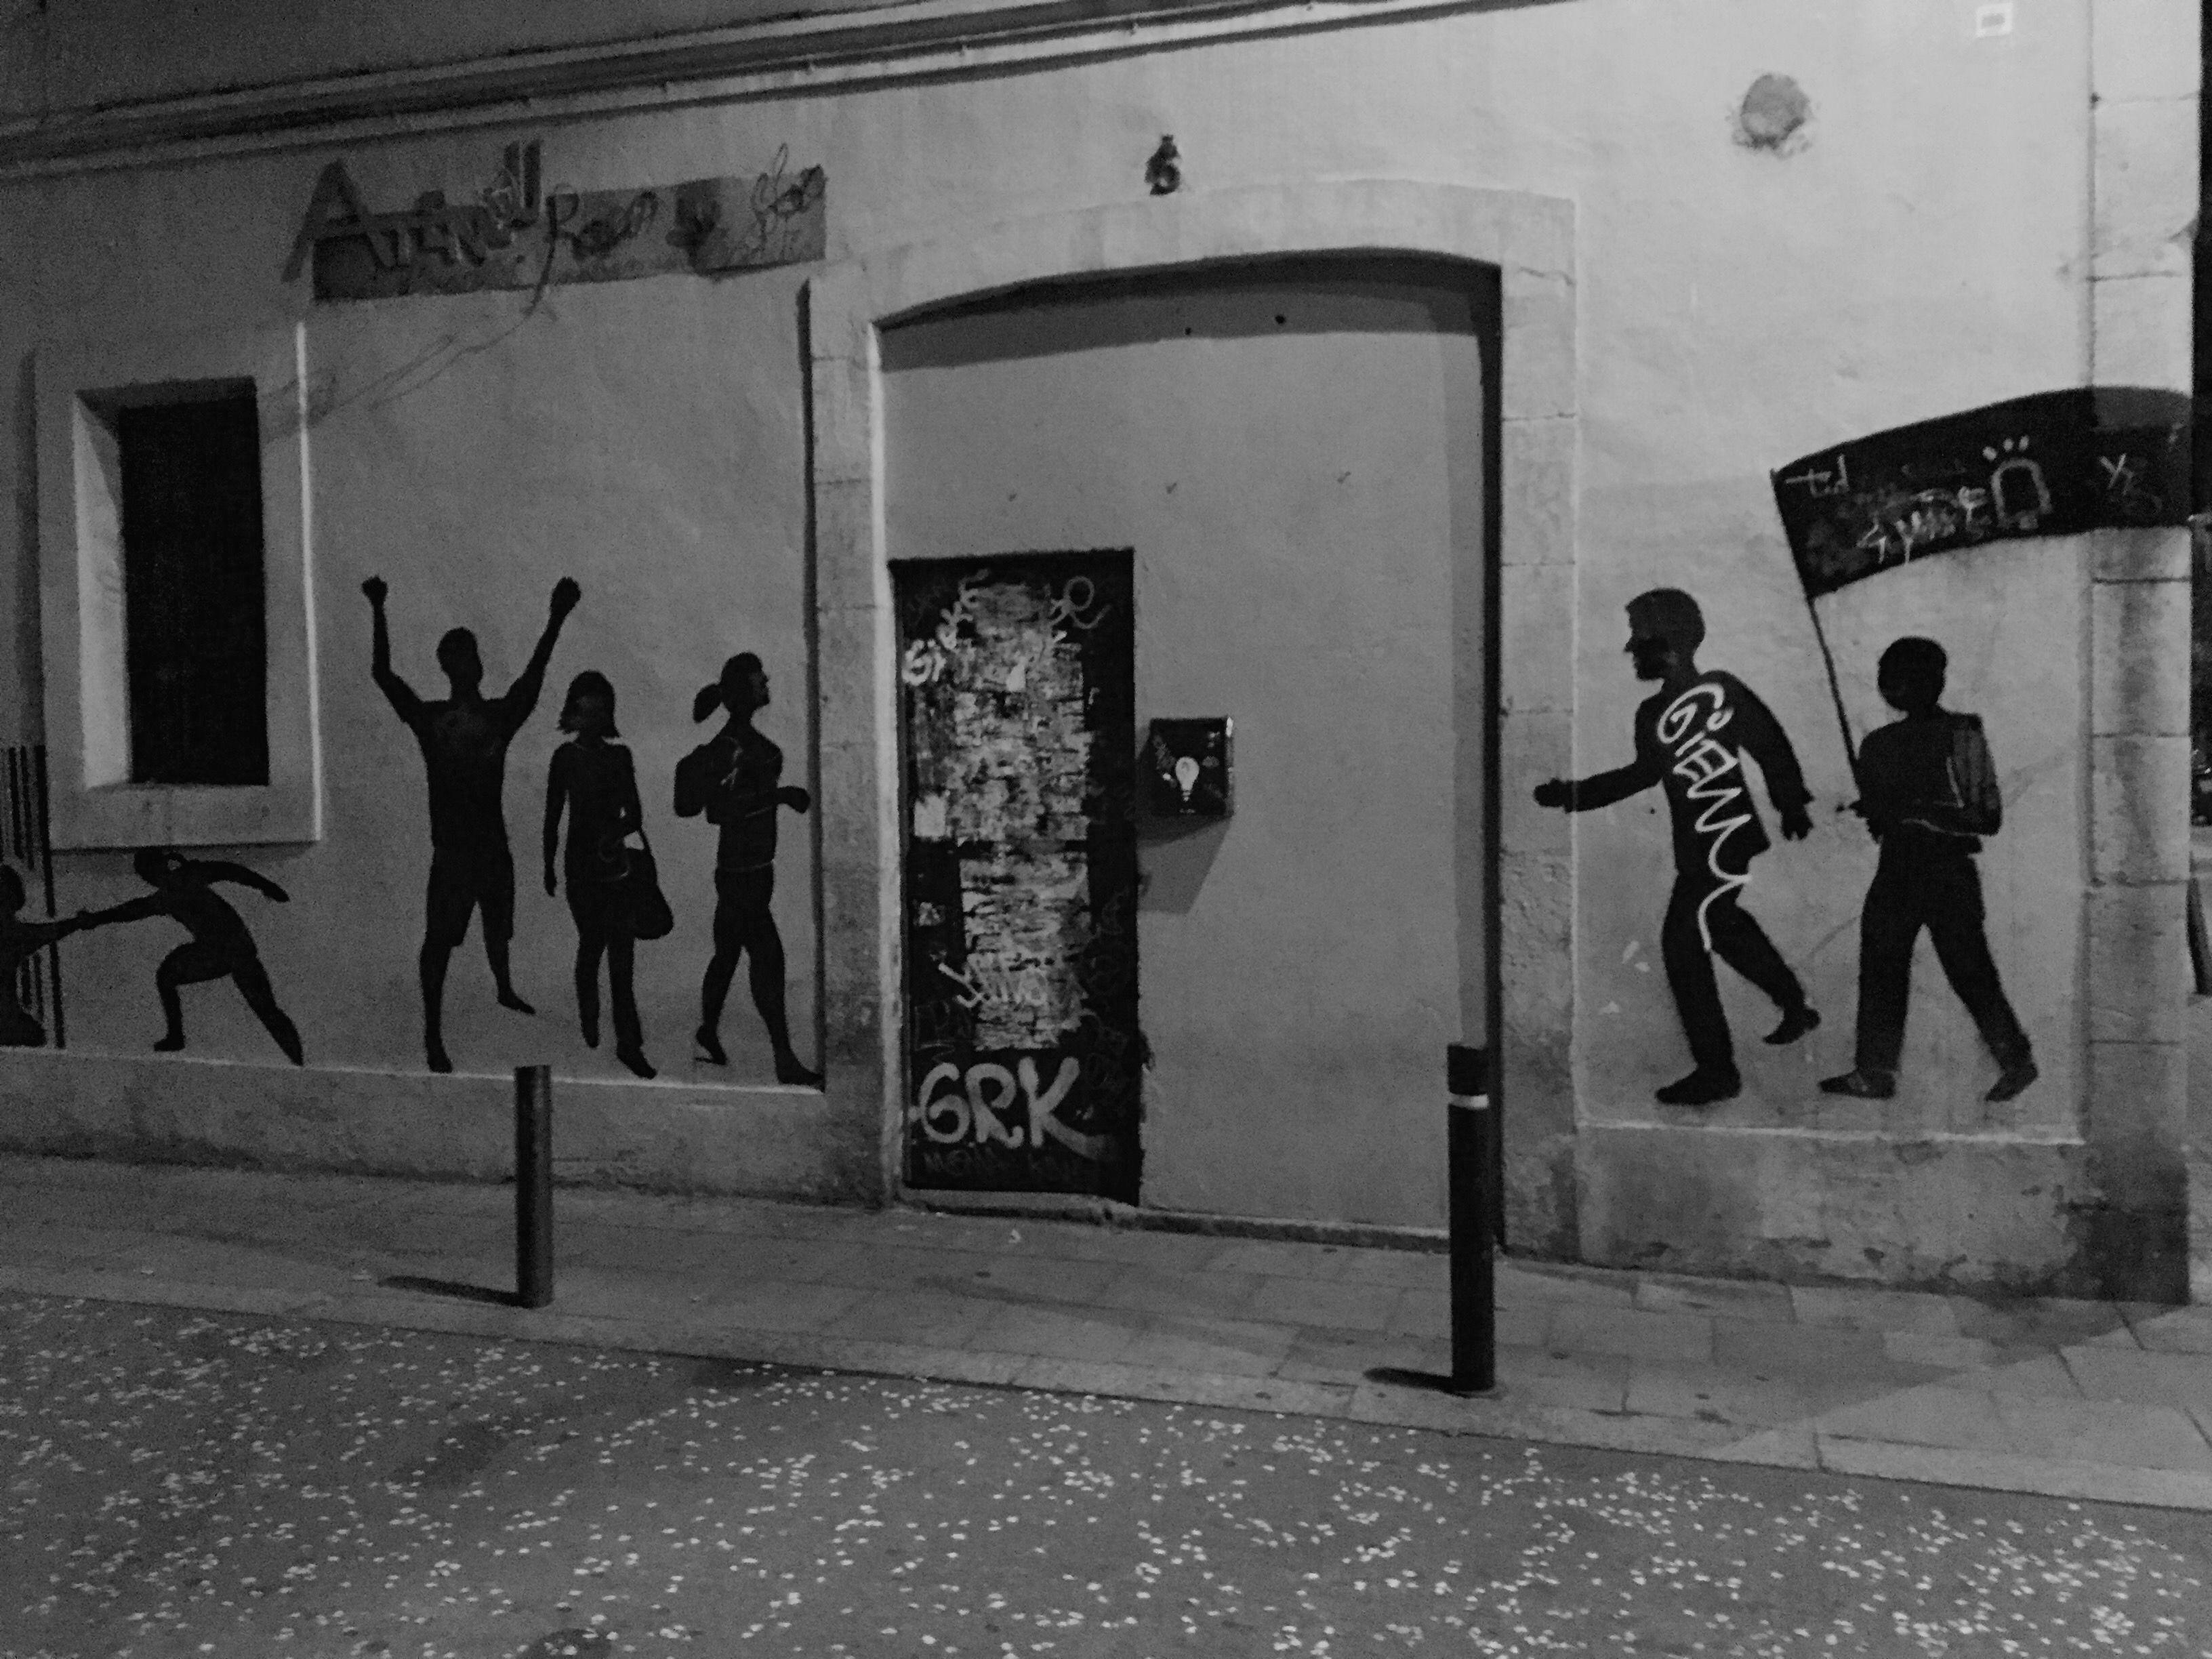 Pin by violaine degas on street art pinterest street art